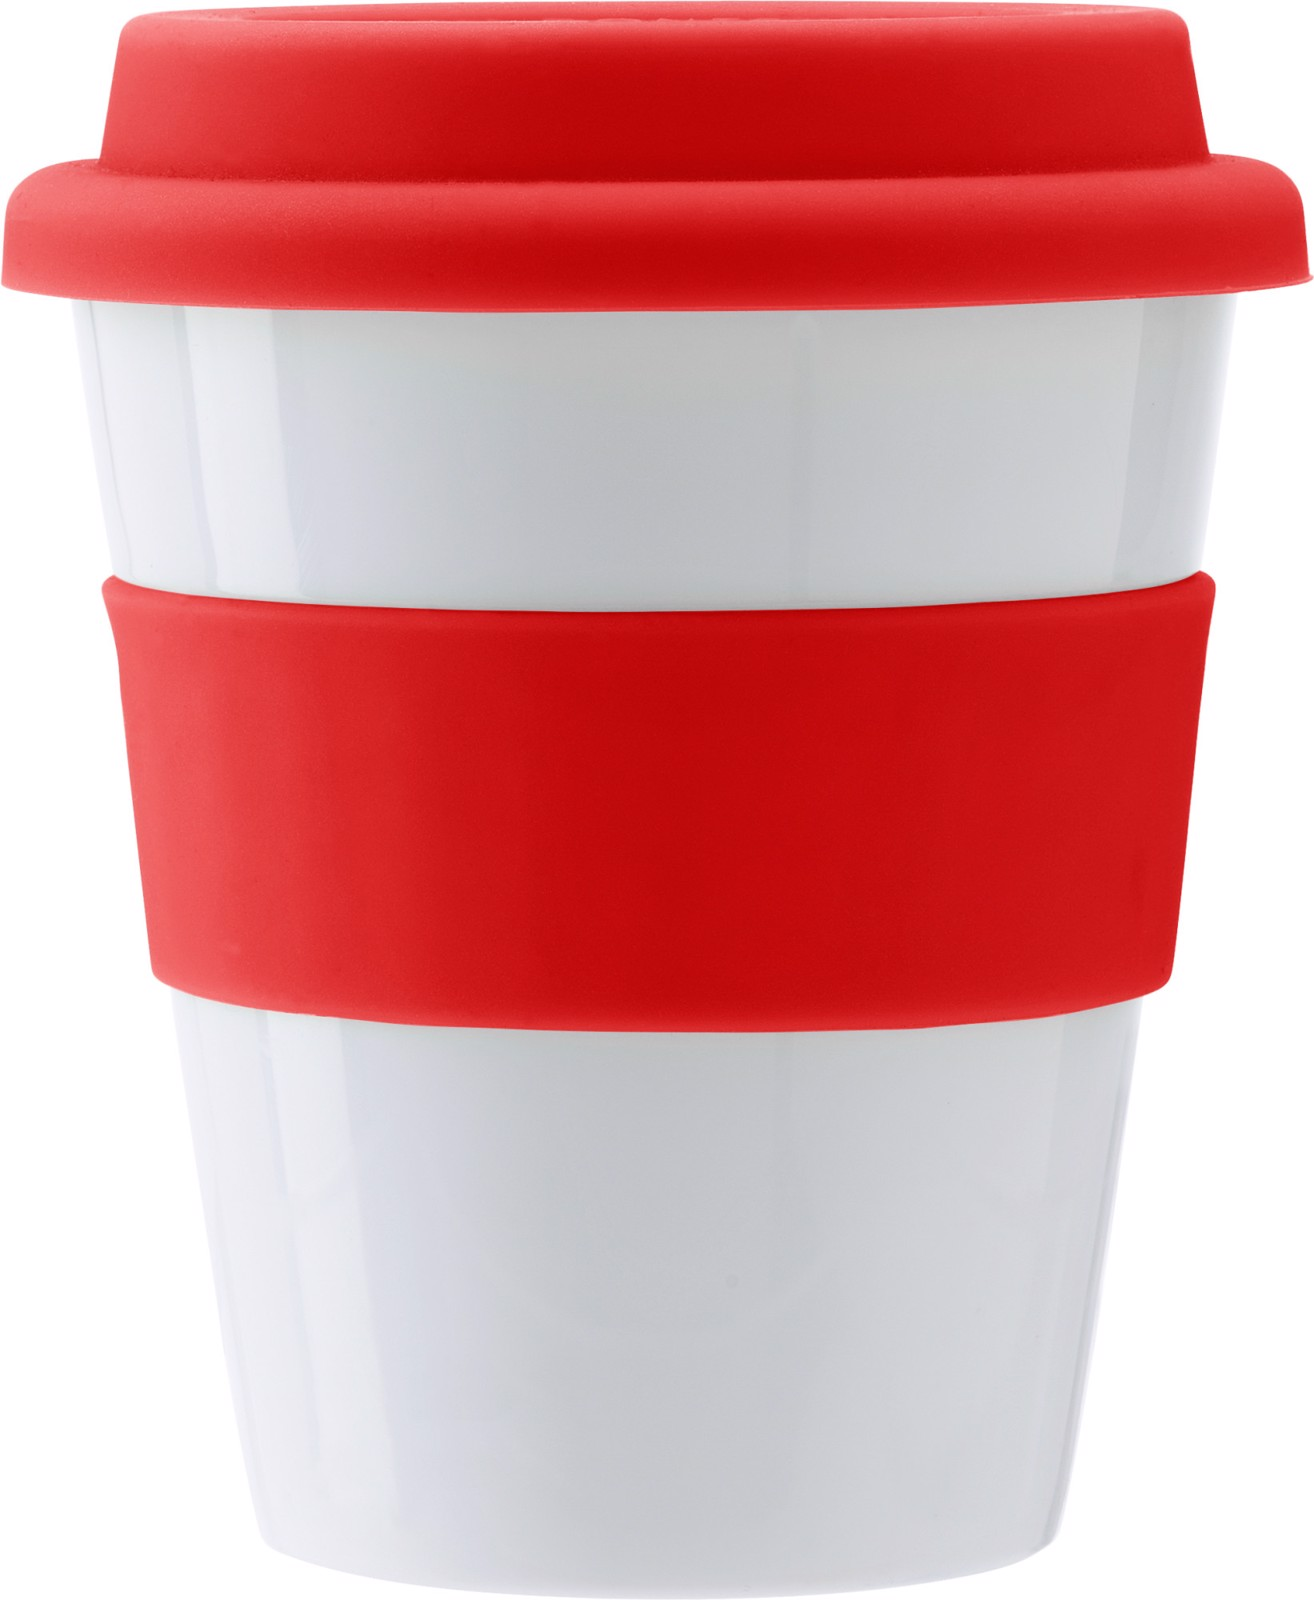 PP plastic drinking mug - Red